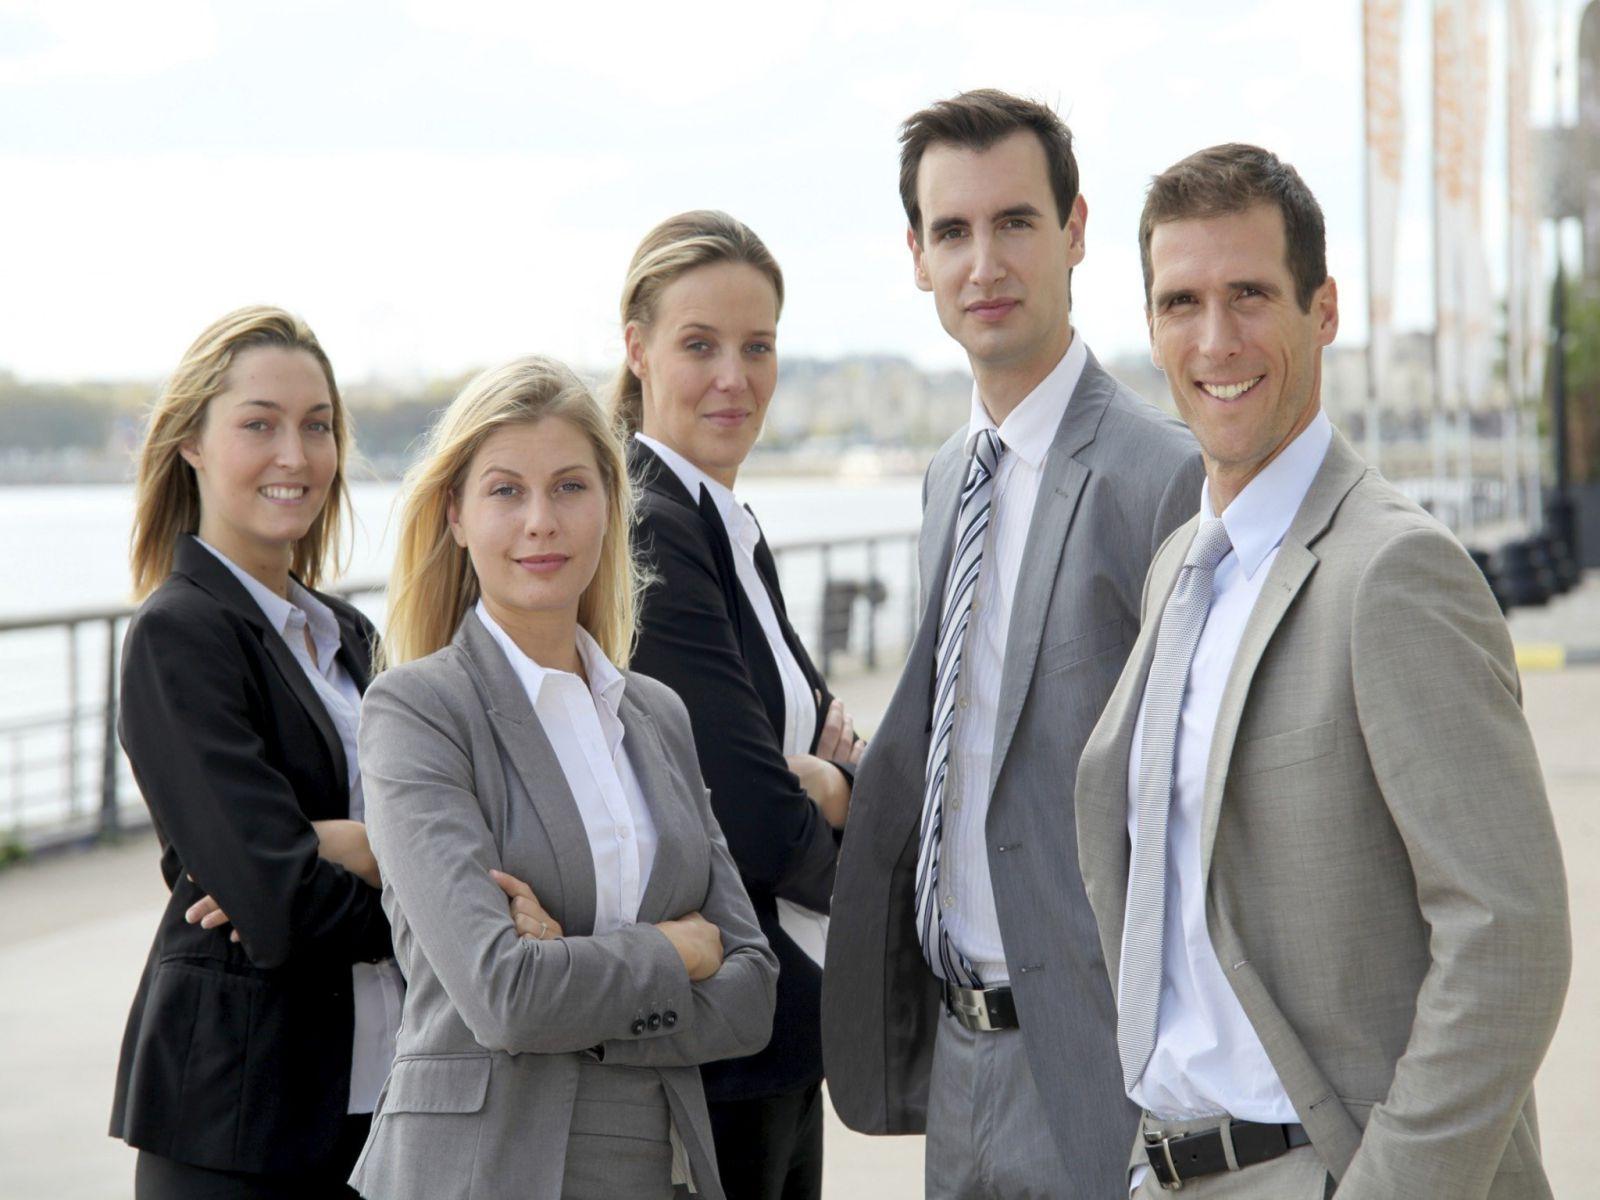 Corsi-professionisti-inglese-francese-tedesco-reggio-emilia-MANDARINO